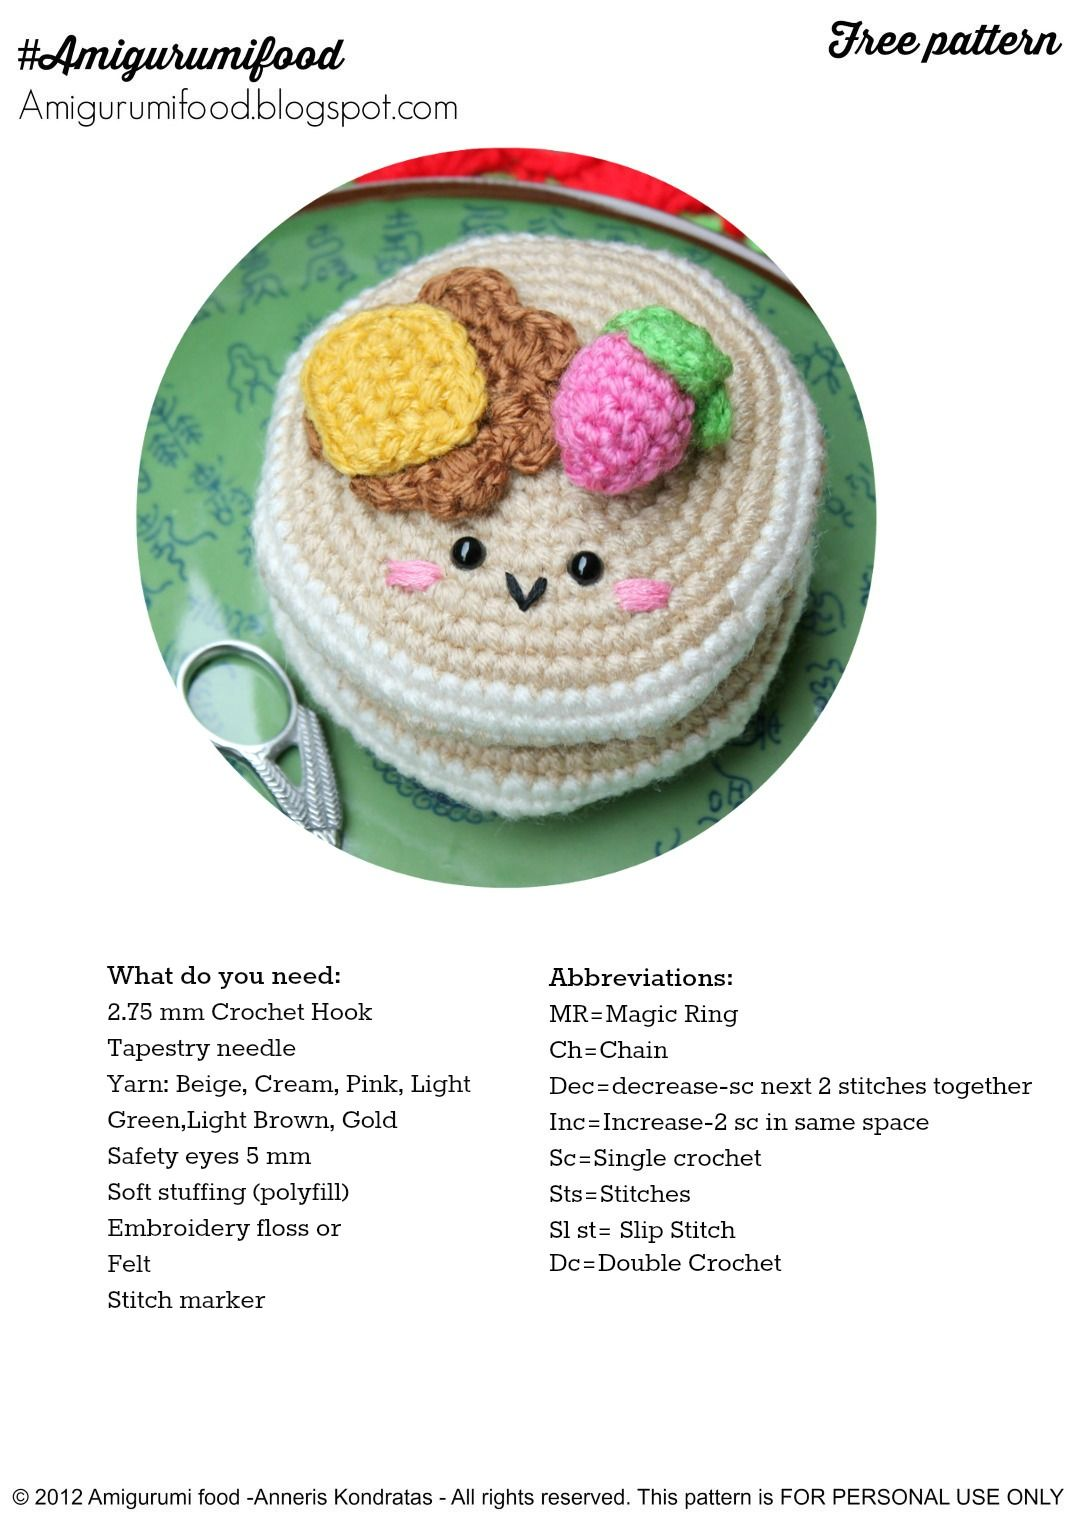 501 Best Amigurumi food images in 2020 | Crochet food, Amigurumi ... | 1528x1080